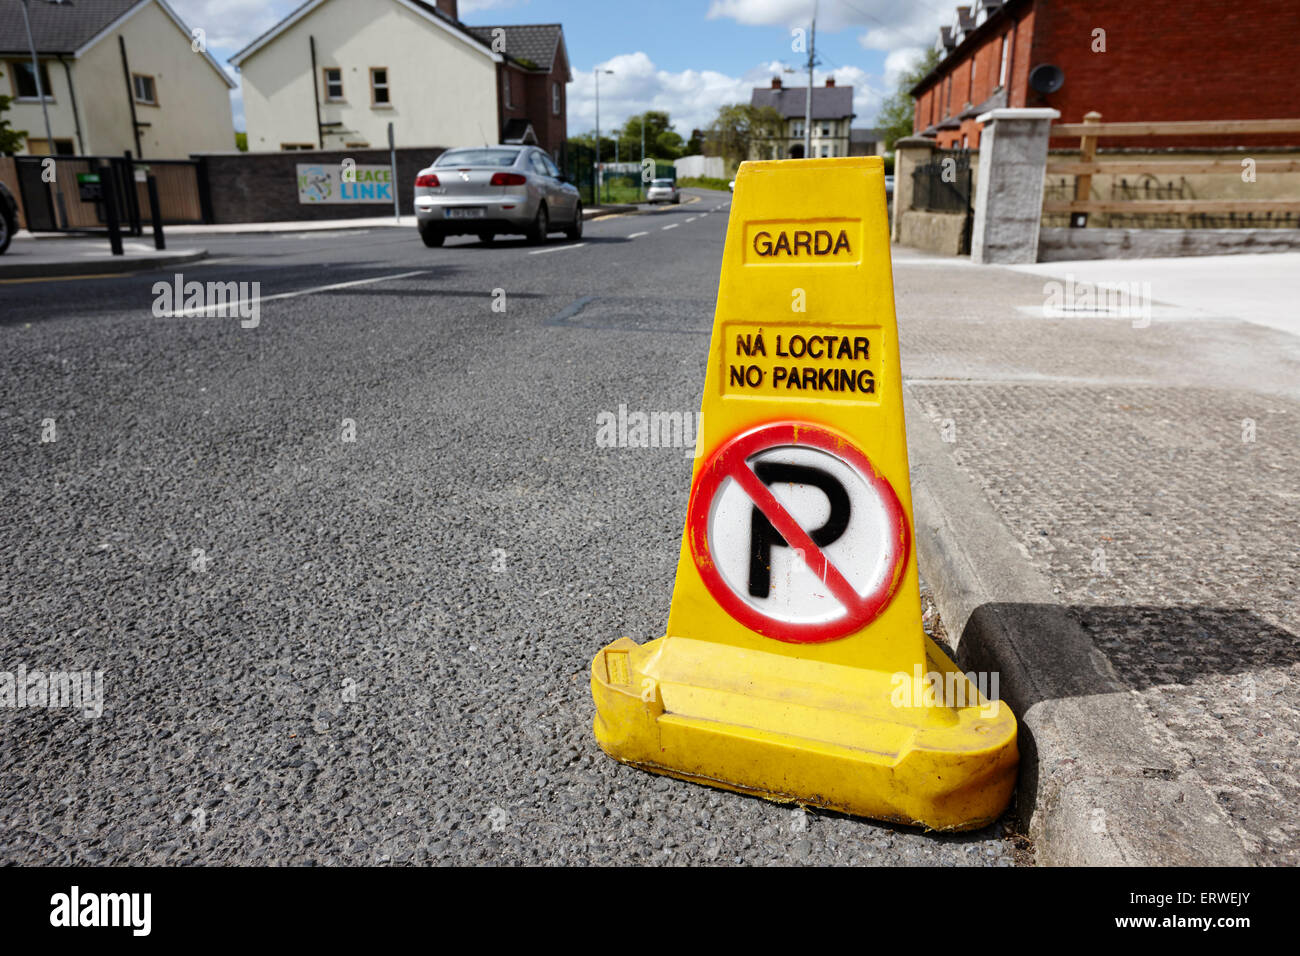 Republic of IrelandUnited Kingdom border - Wikipedia